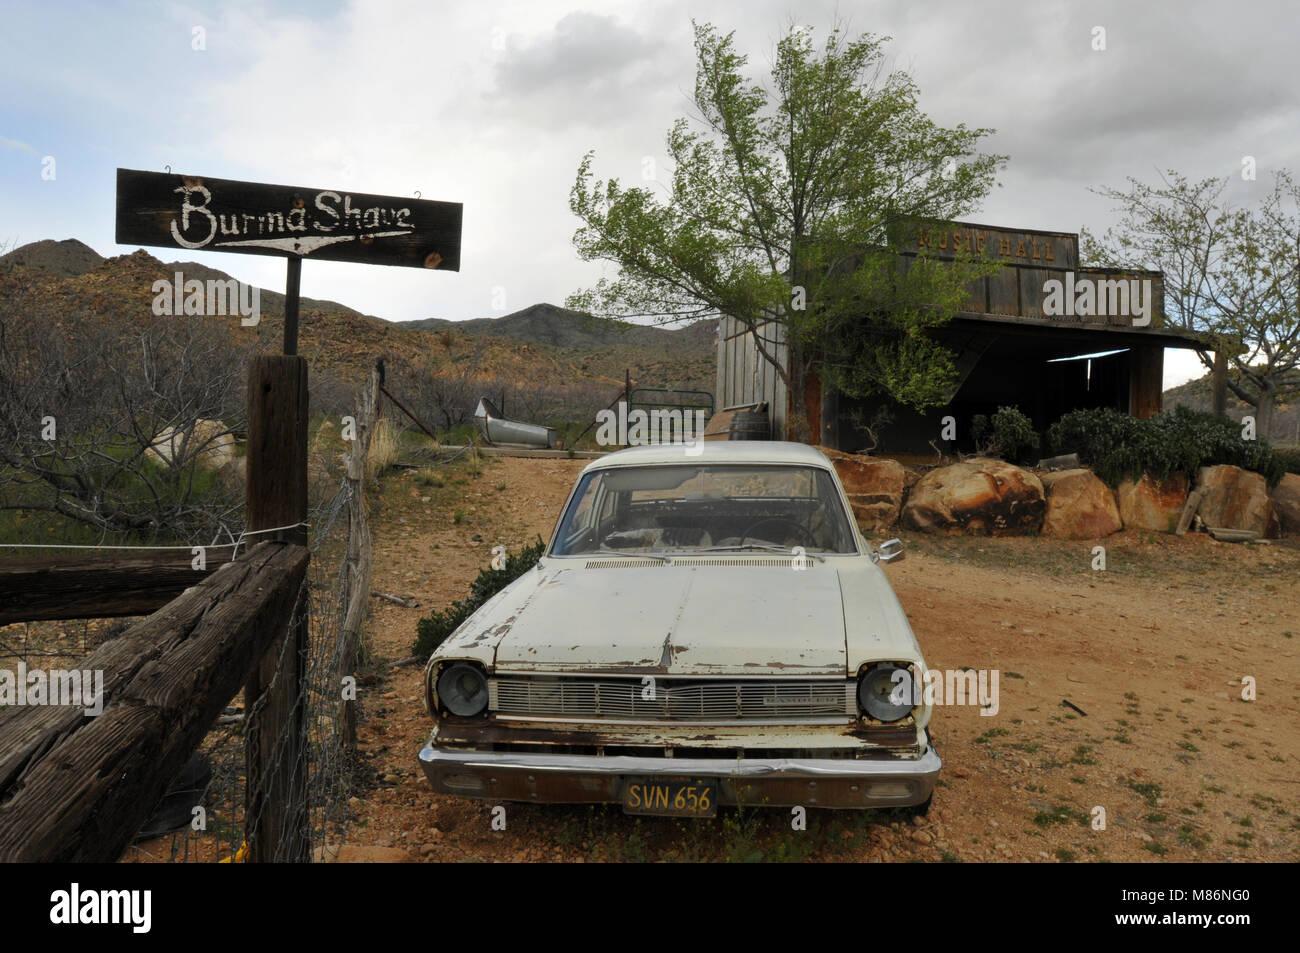 roadside attraction arizona stock photos roadside attraction arizona stock images alamy. Black Bedroom Furniture Sets. Home Design Ideas